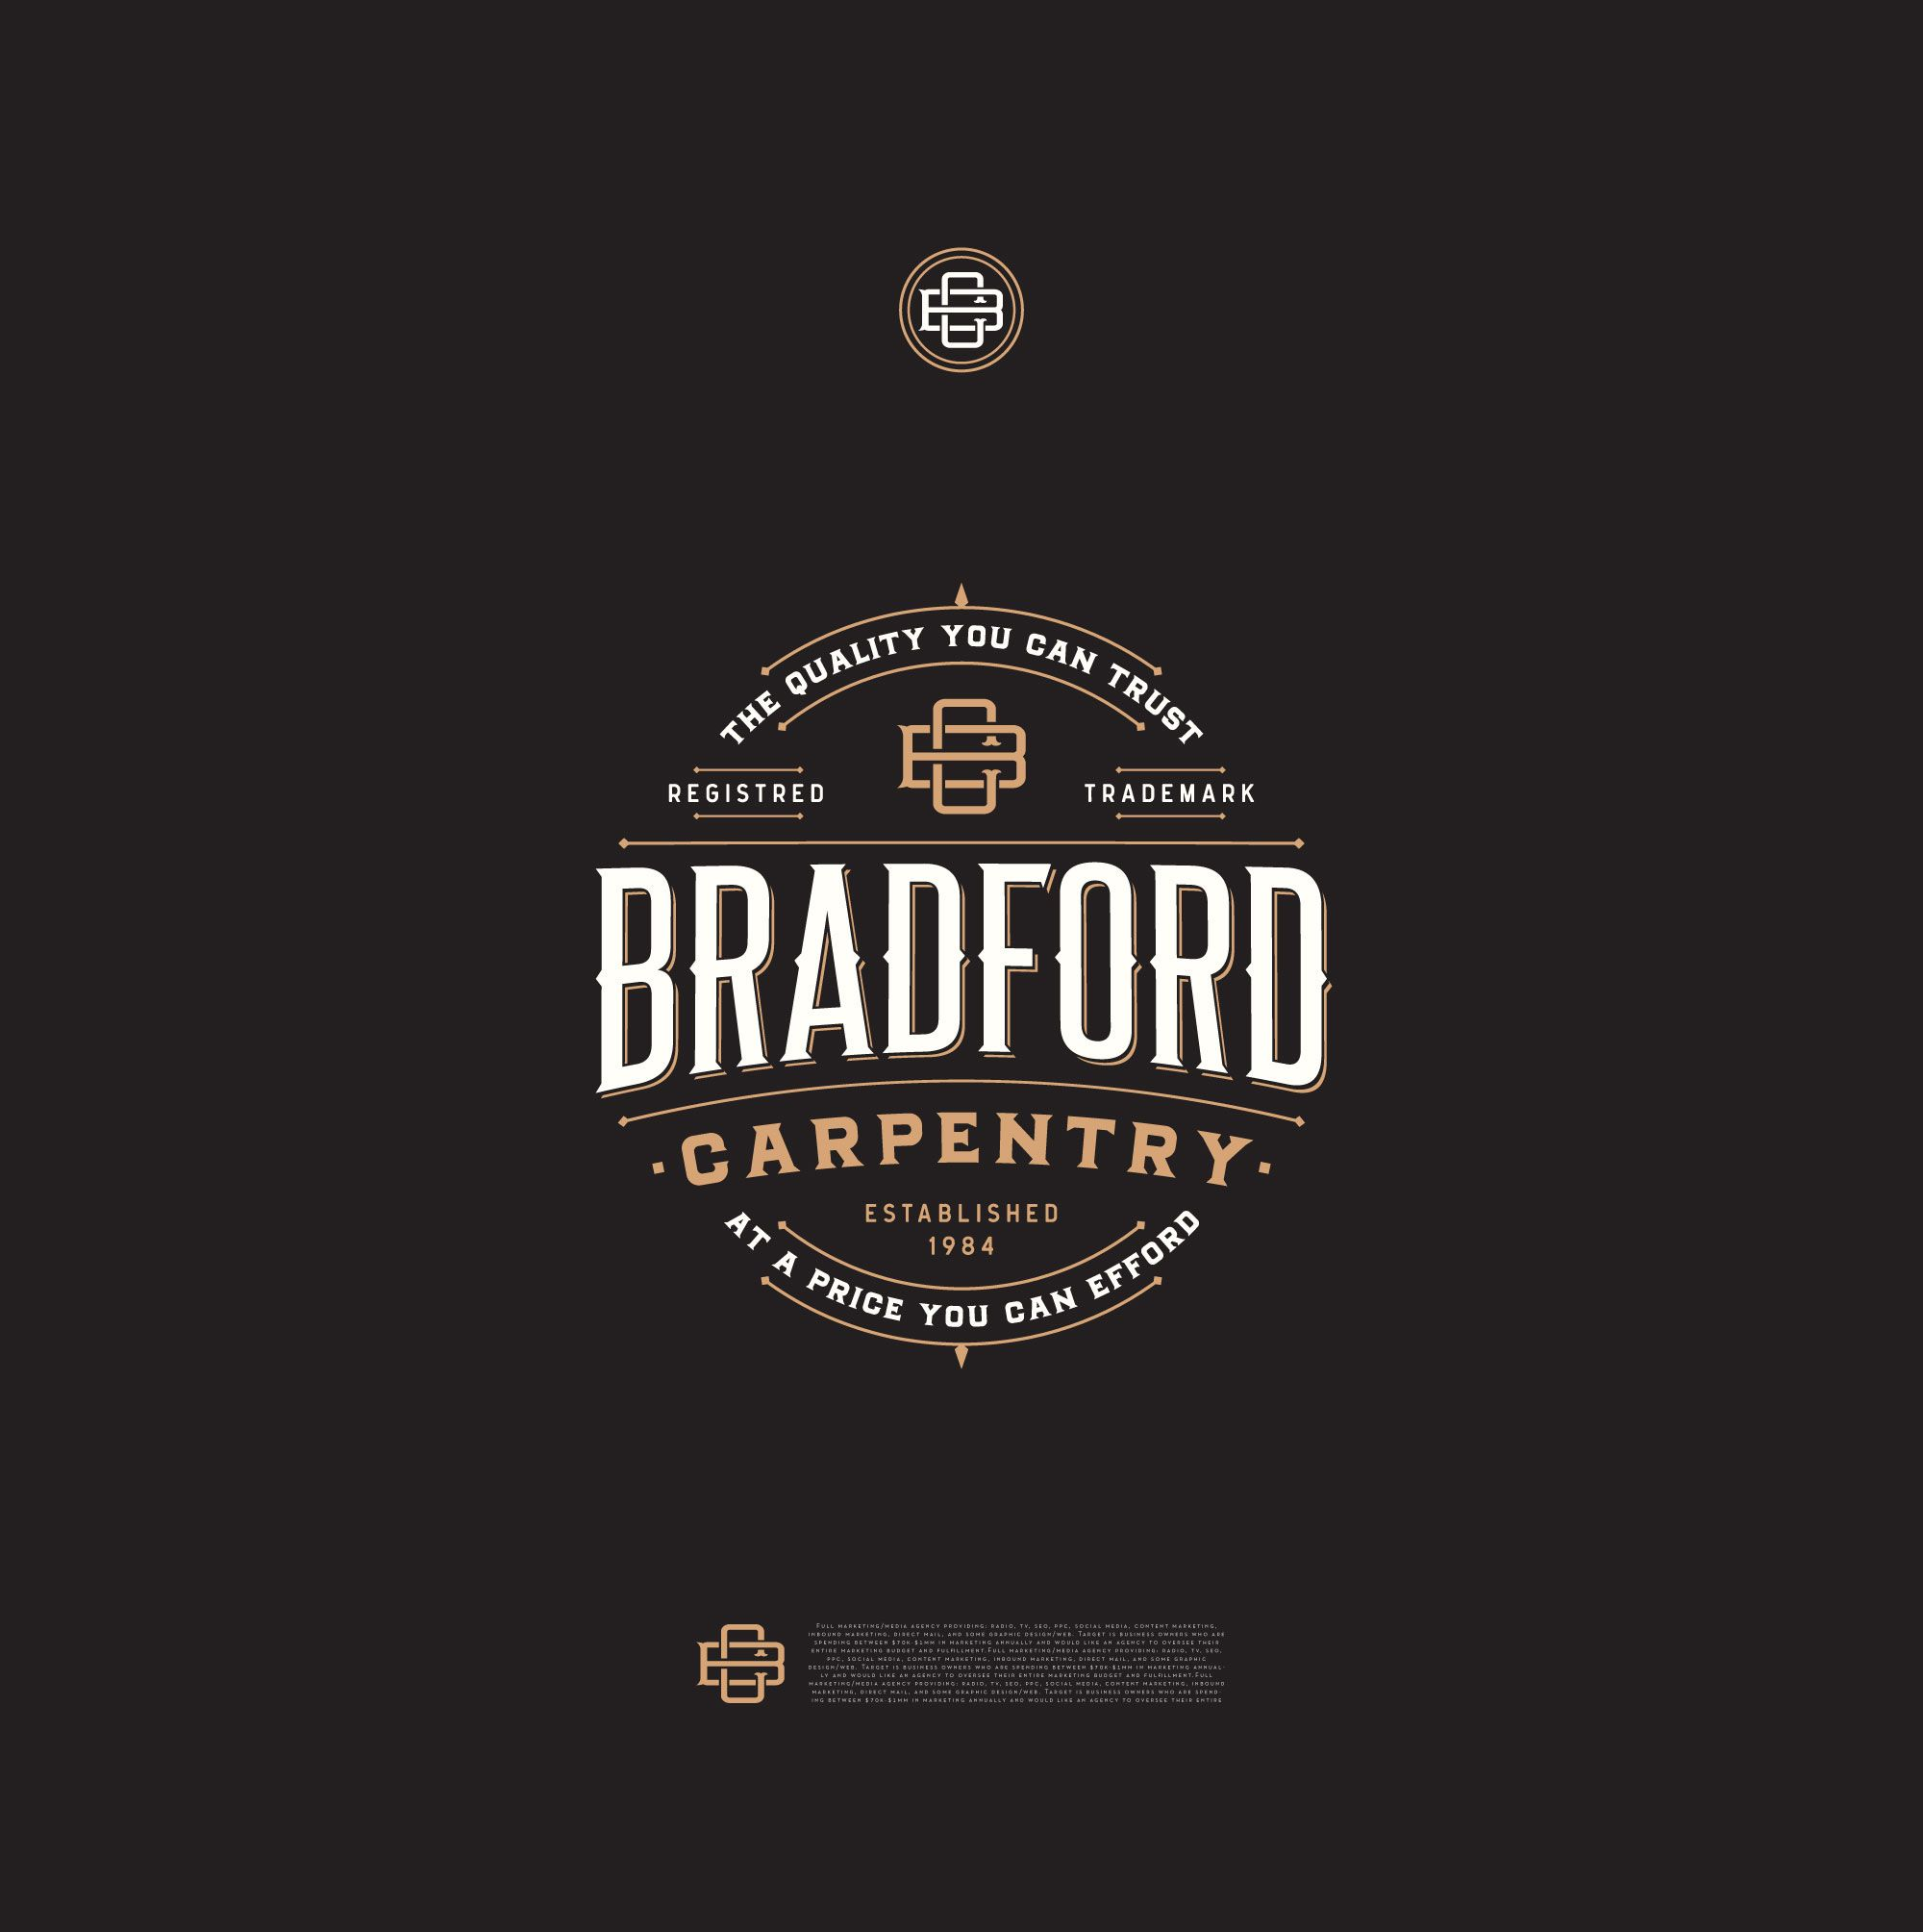 Bradford Carpentry - Logo | /LET/ | Pinterest | Carpentry, Logos and ...